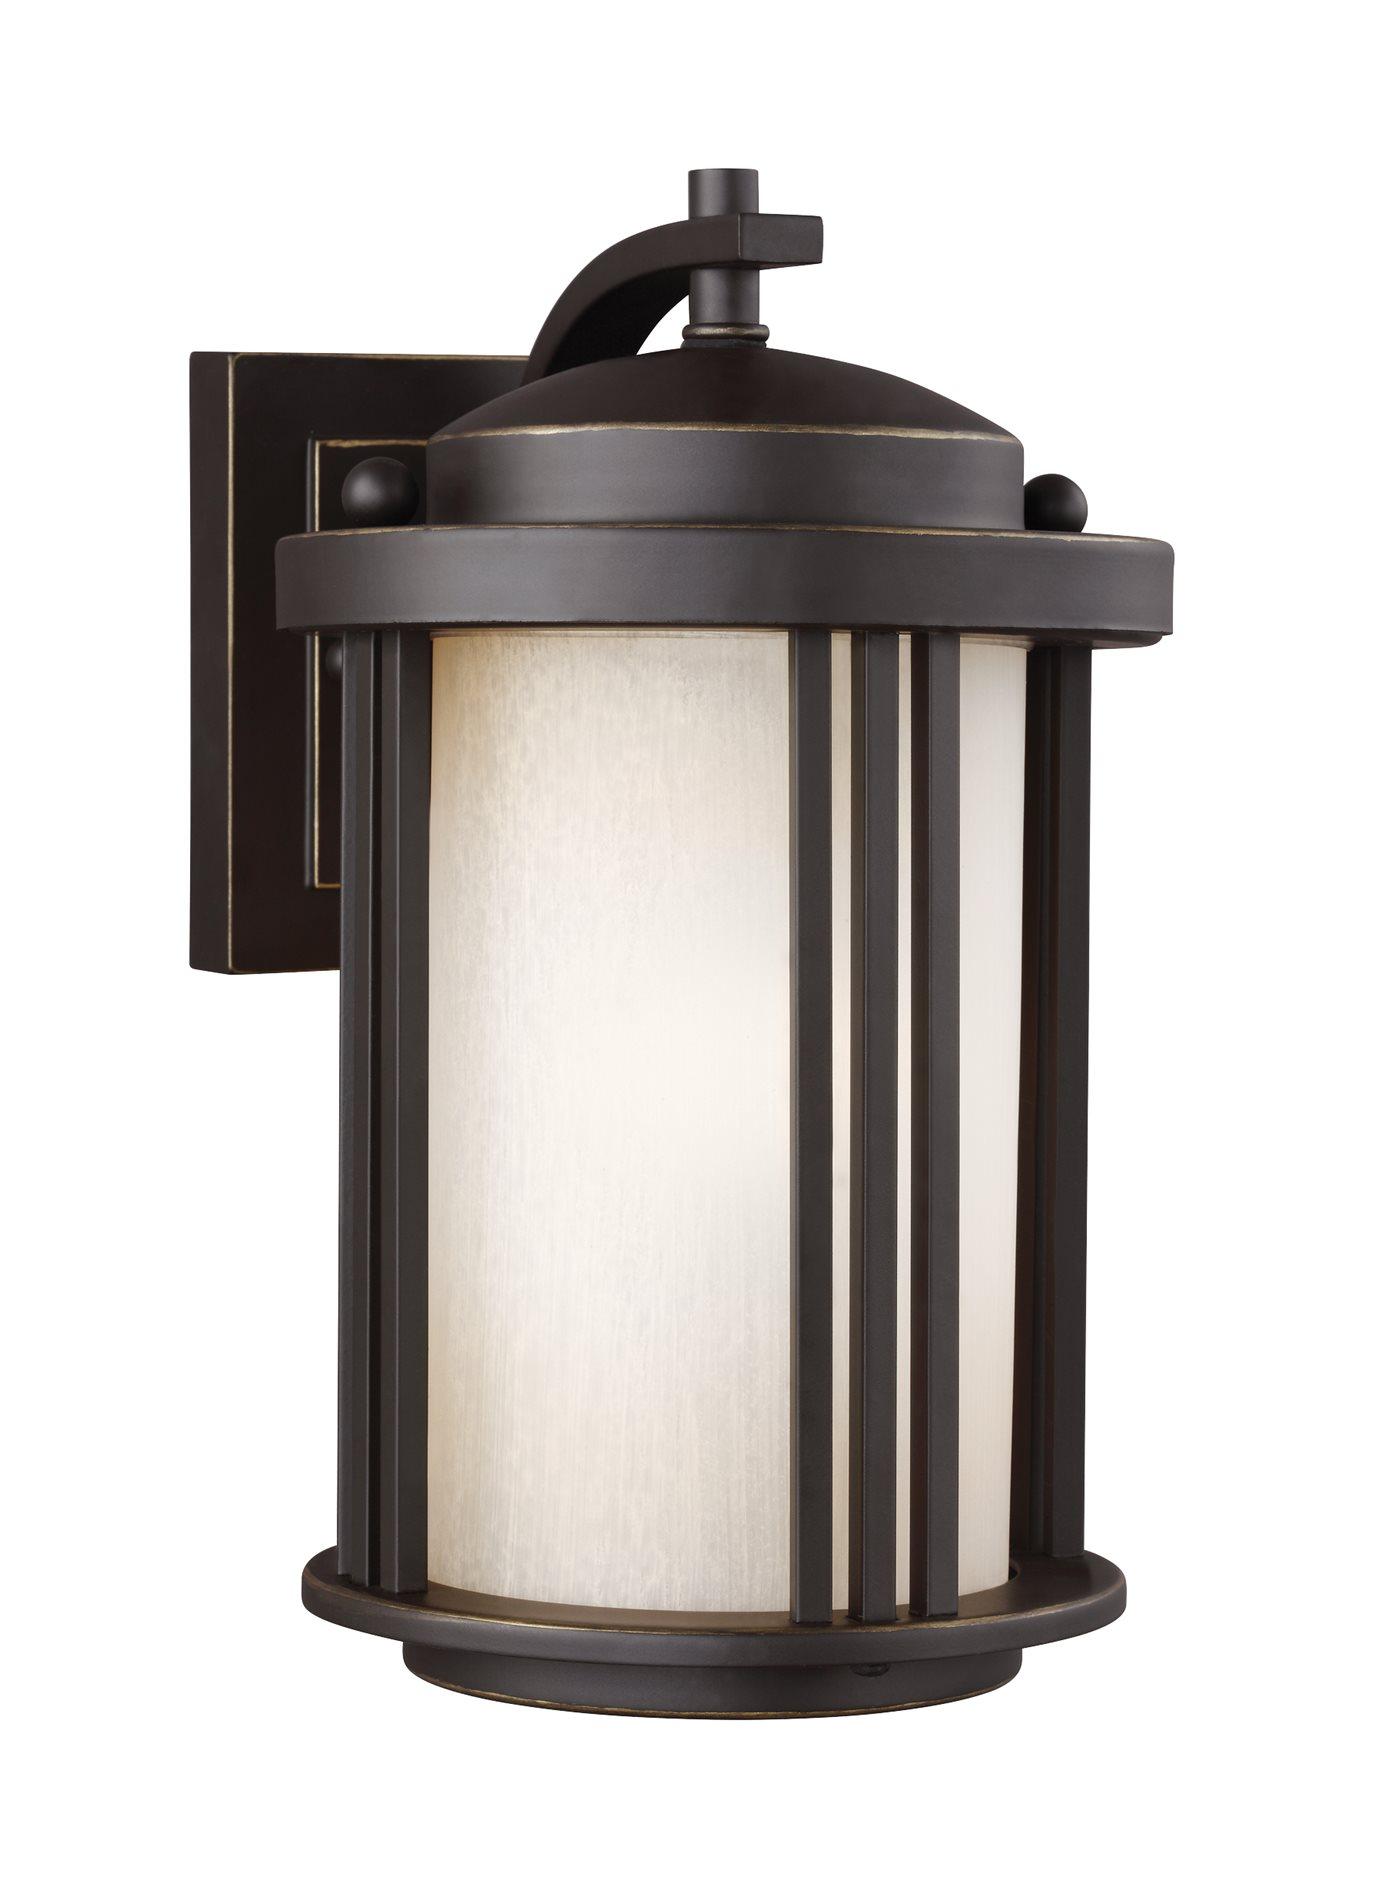 Sea Gull Lighting 8547901BLE 71 Crowell Modern Contemporary Lamp SG 8547901